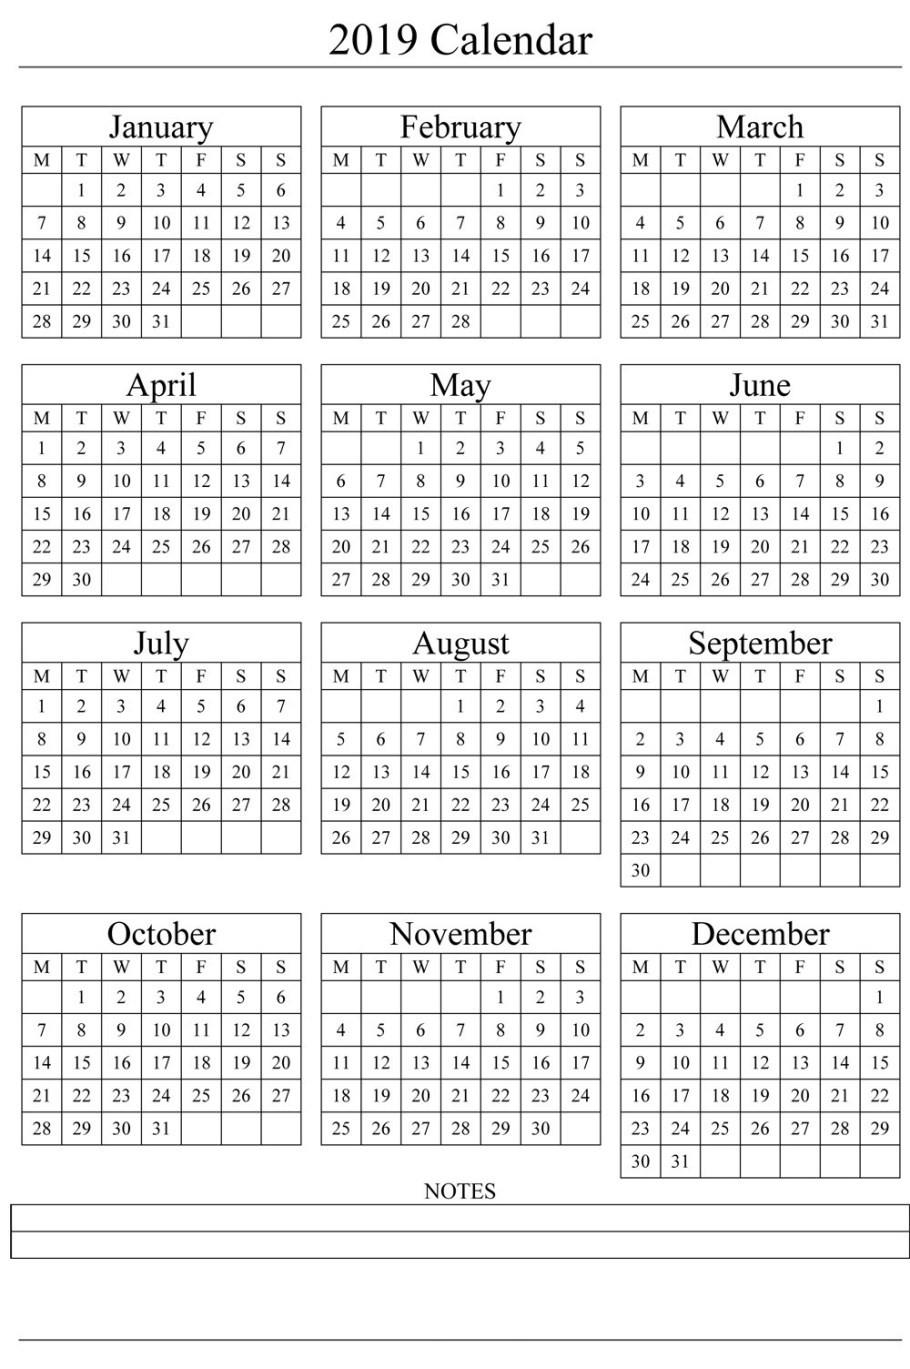 2019 Yearly Calendar Printable Templates – Holidays PDF